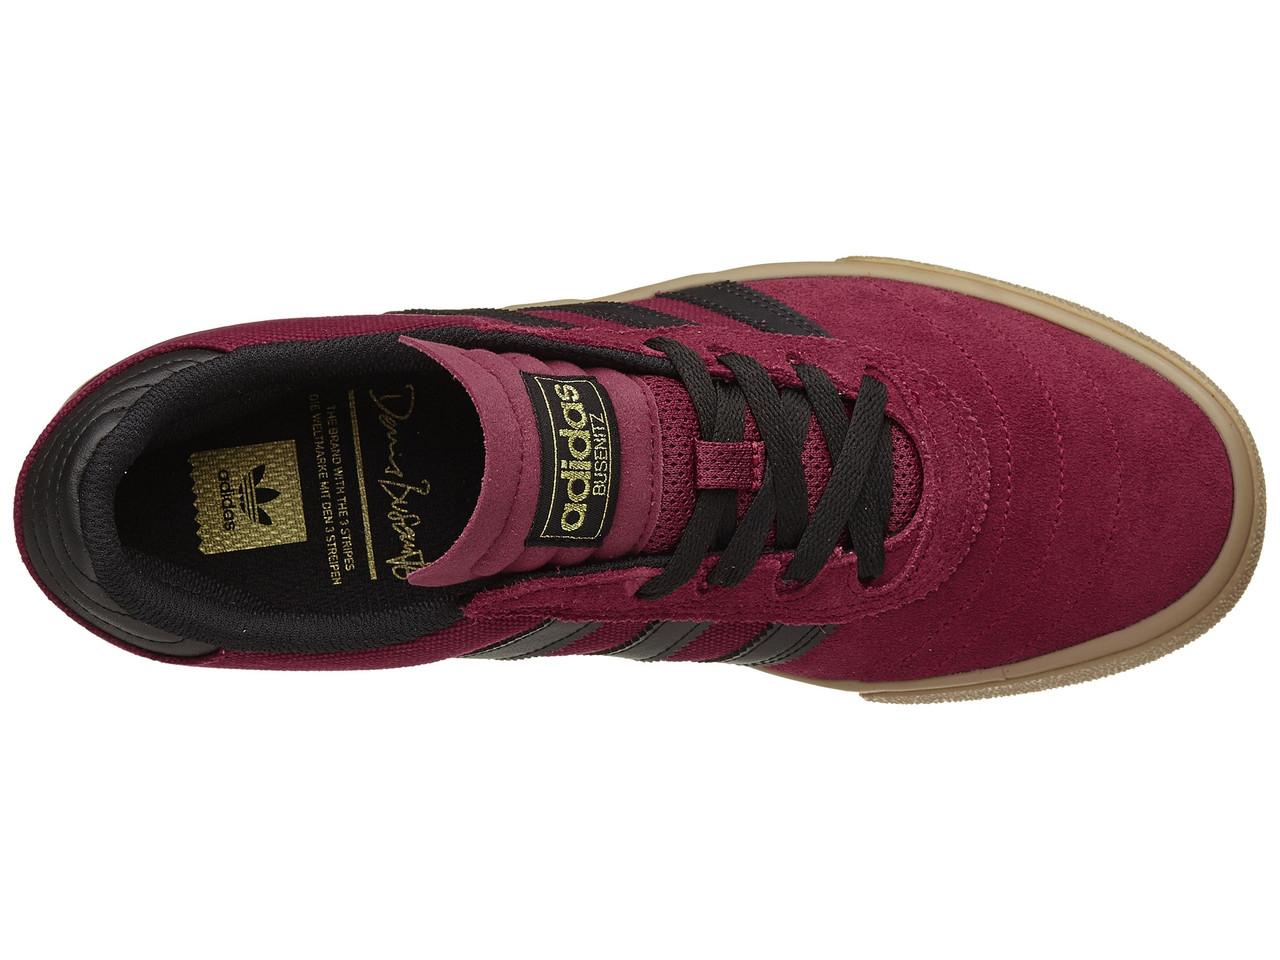 Busenitz Gum Adidas Black Pro Burgundy Shoes Skate Vulc bfv76ygY